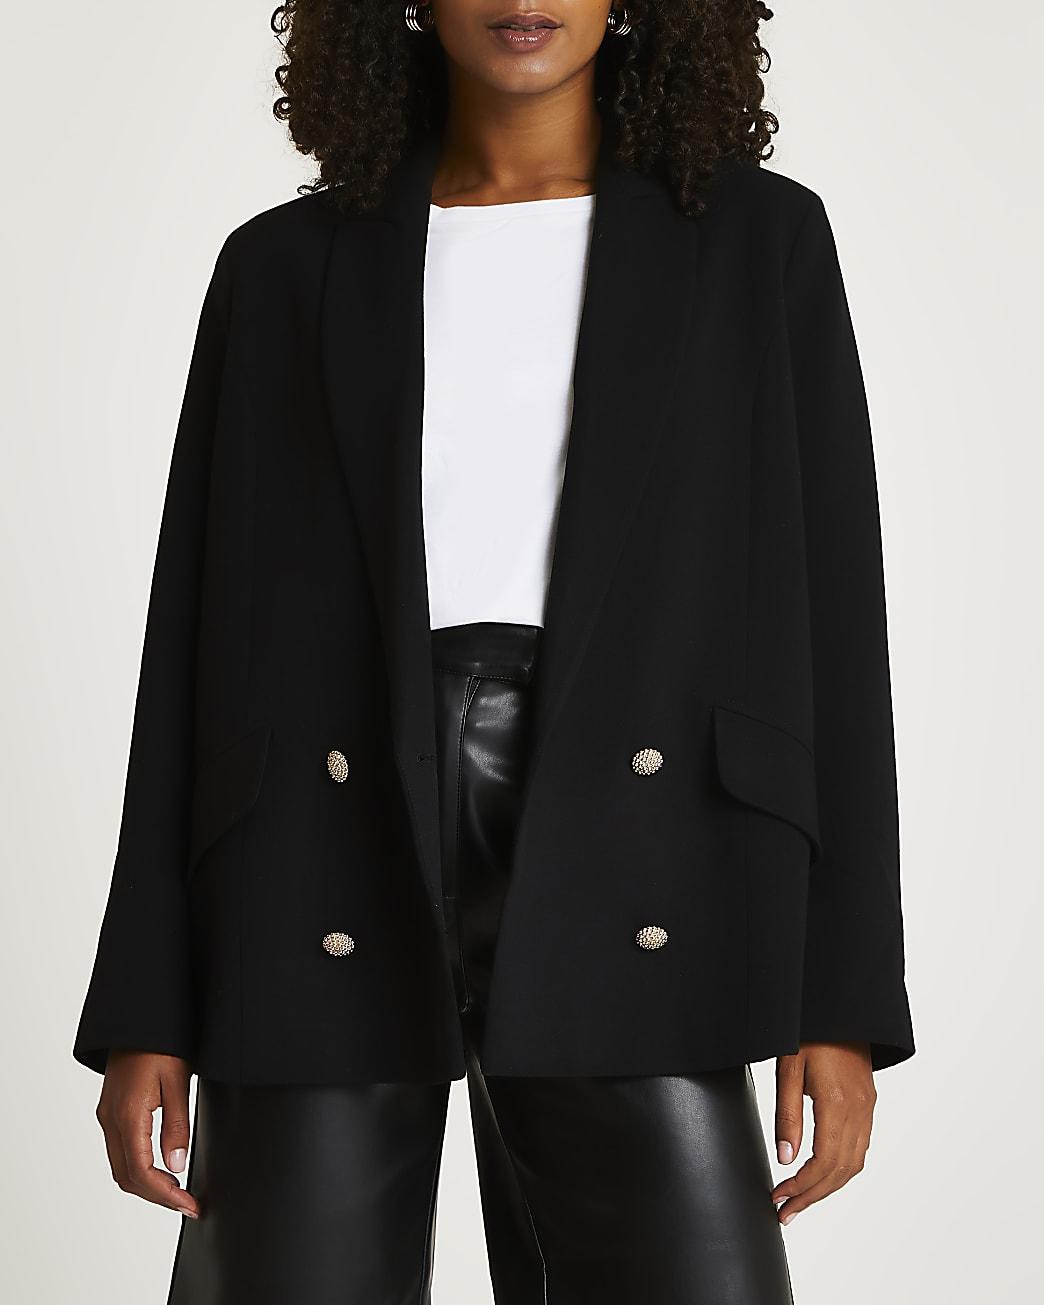 Black double breasted oversized blazer